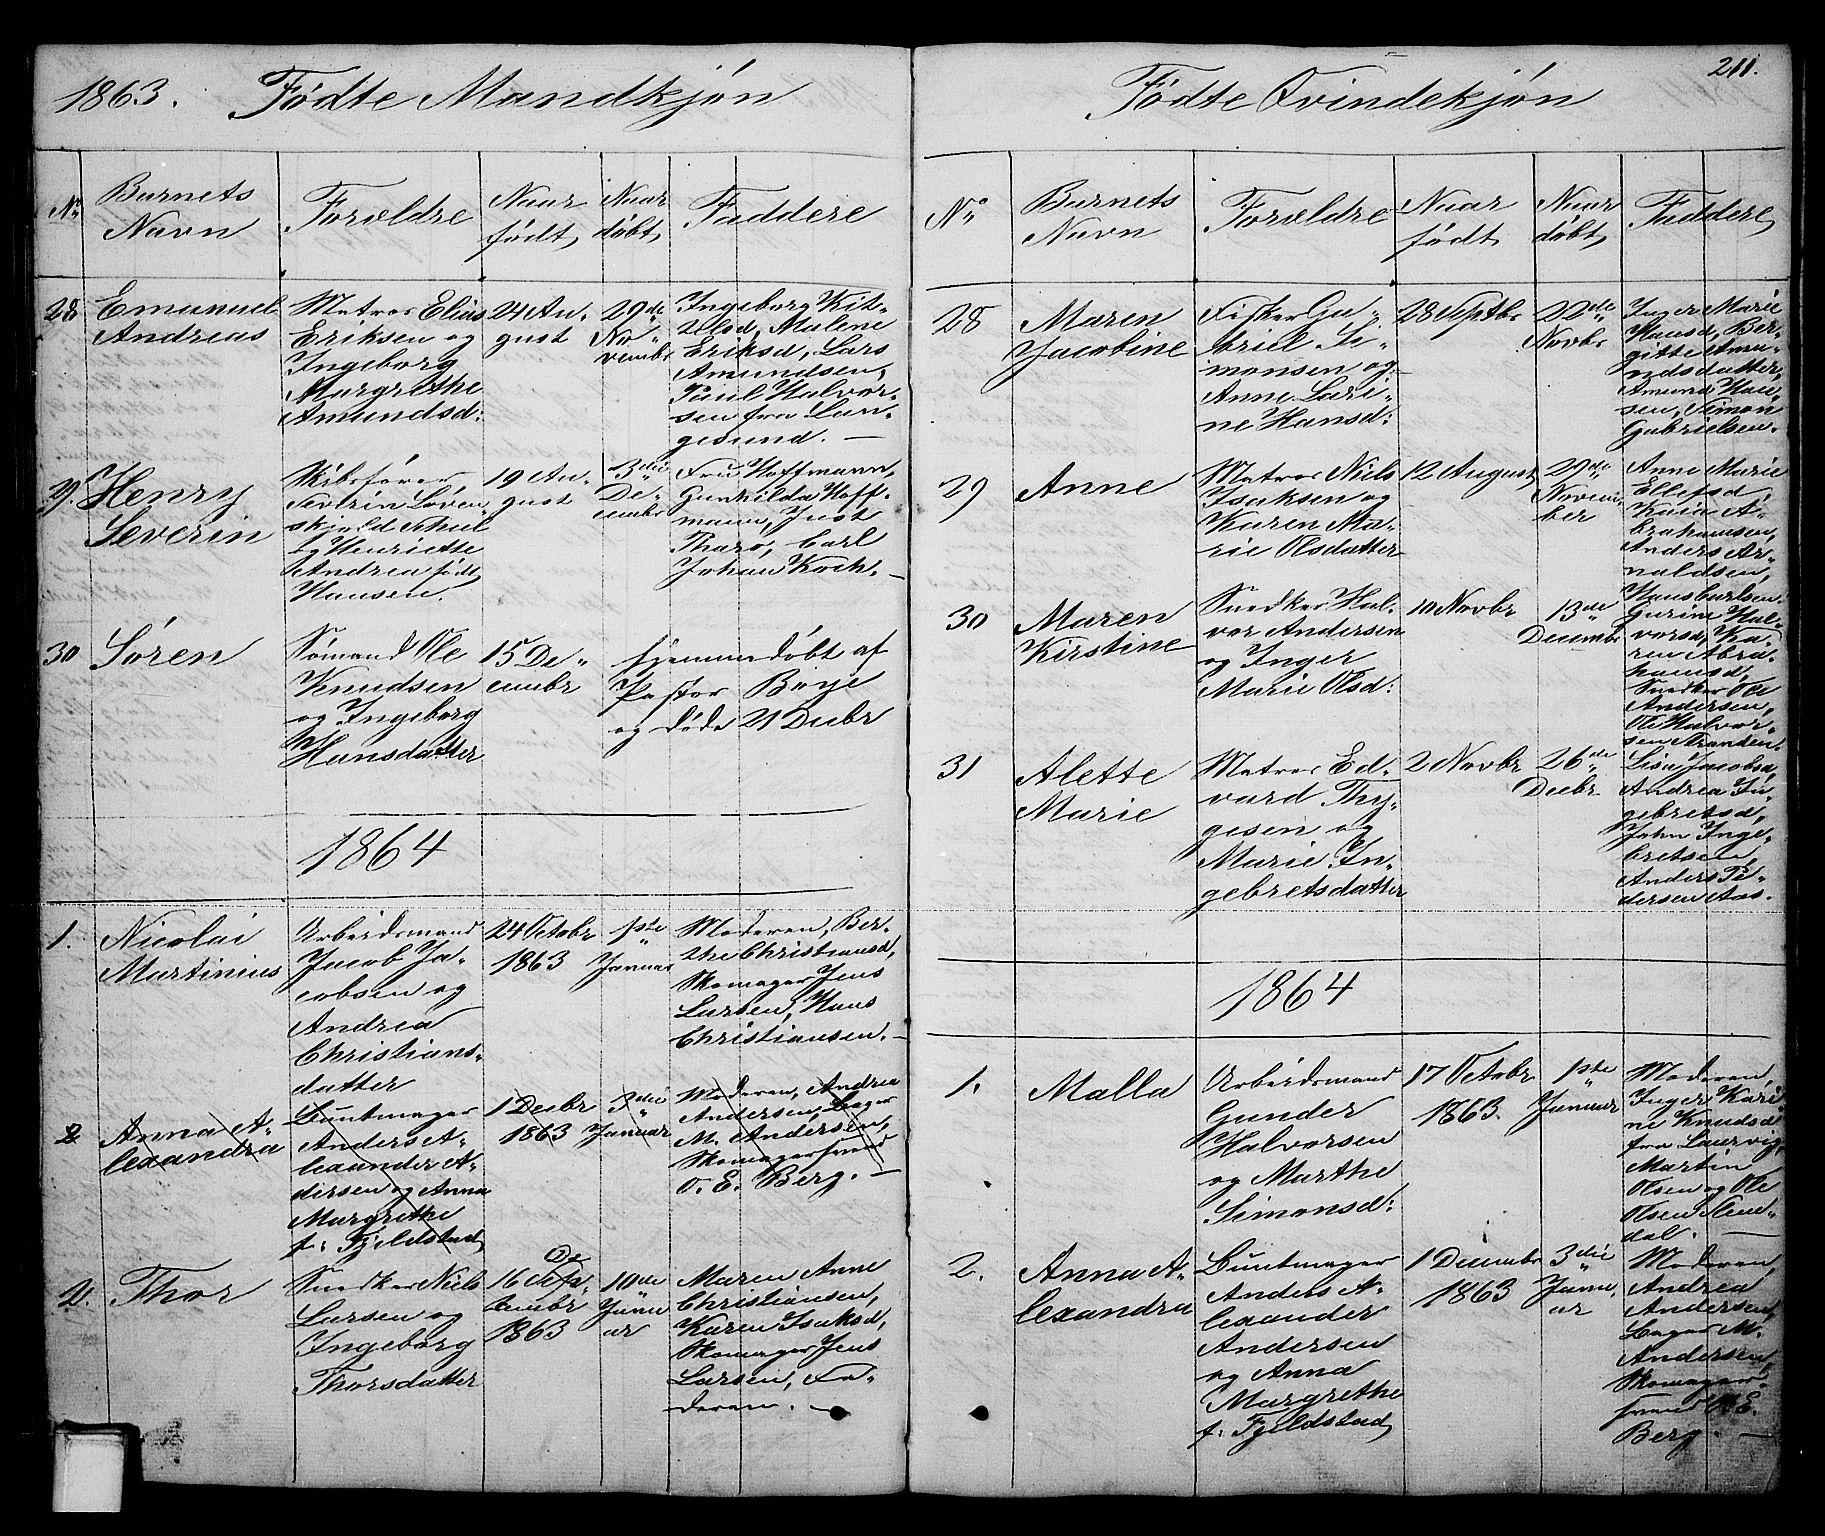 SAKO, Brevik kirkebøker, G/Ga/L0002: Klokkerbok nr. 2, 1846-1865, s. 211